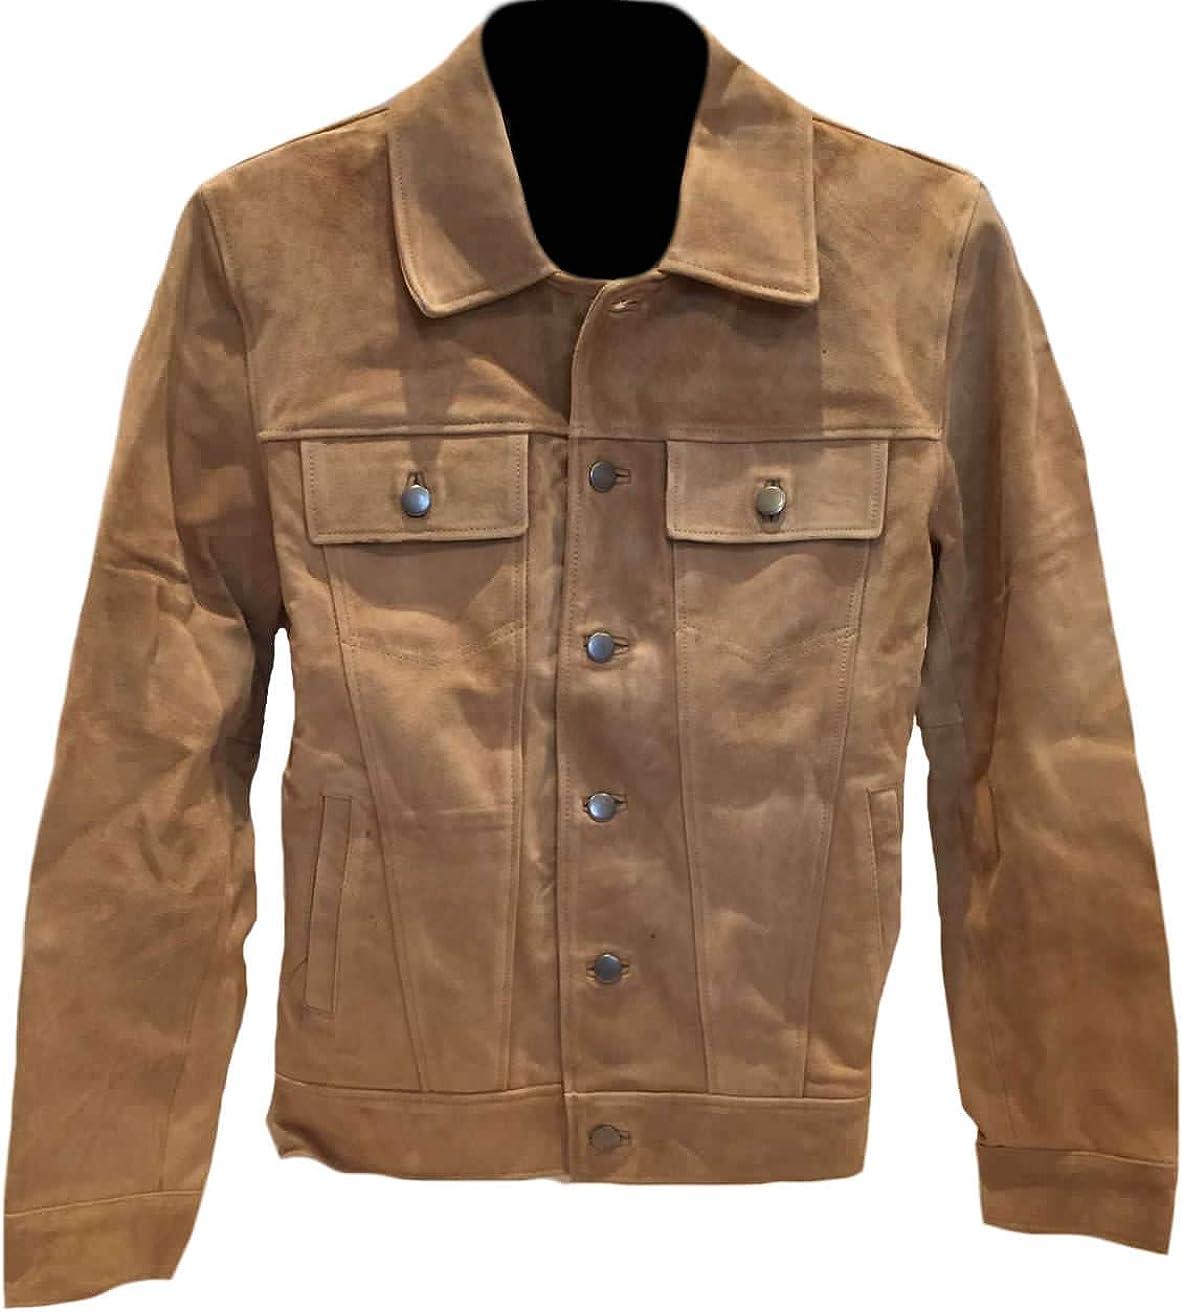 SleekHides Mens Fashion Suede Leather Buttoned Coat